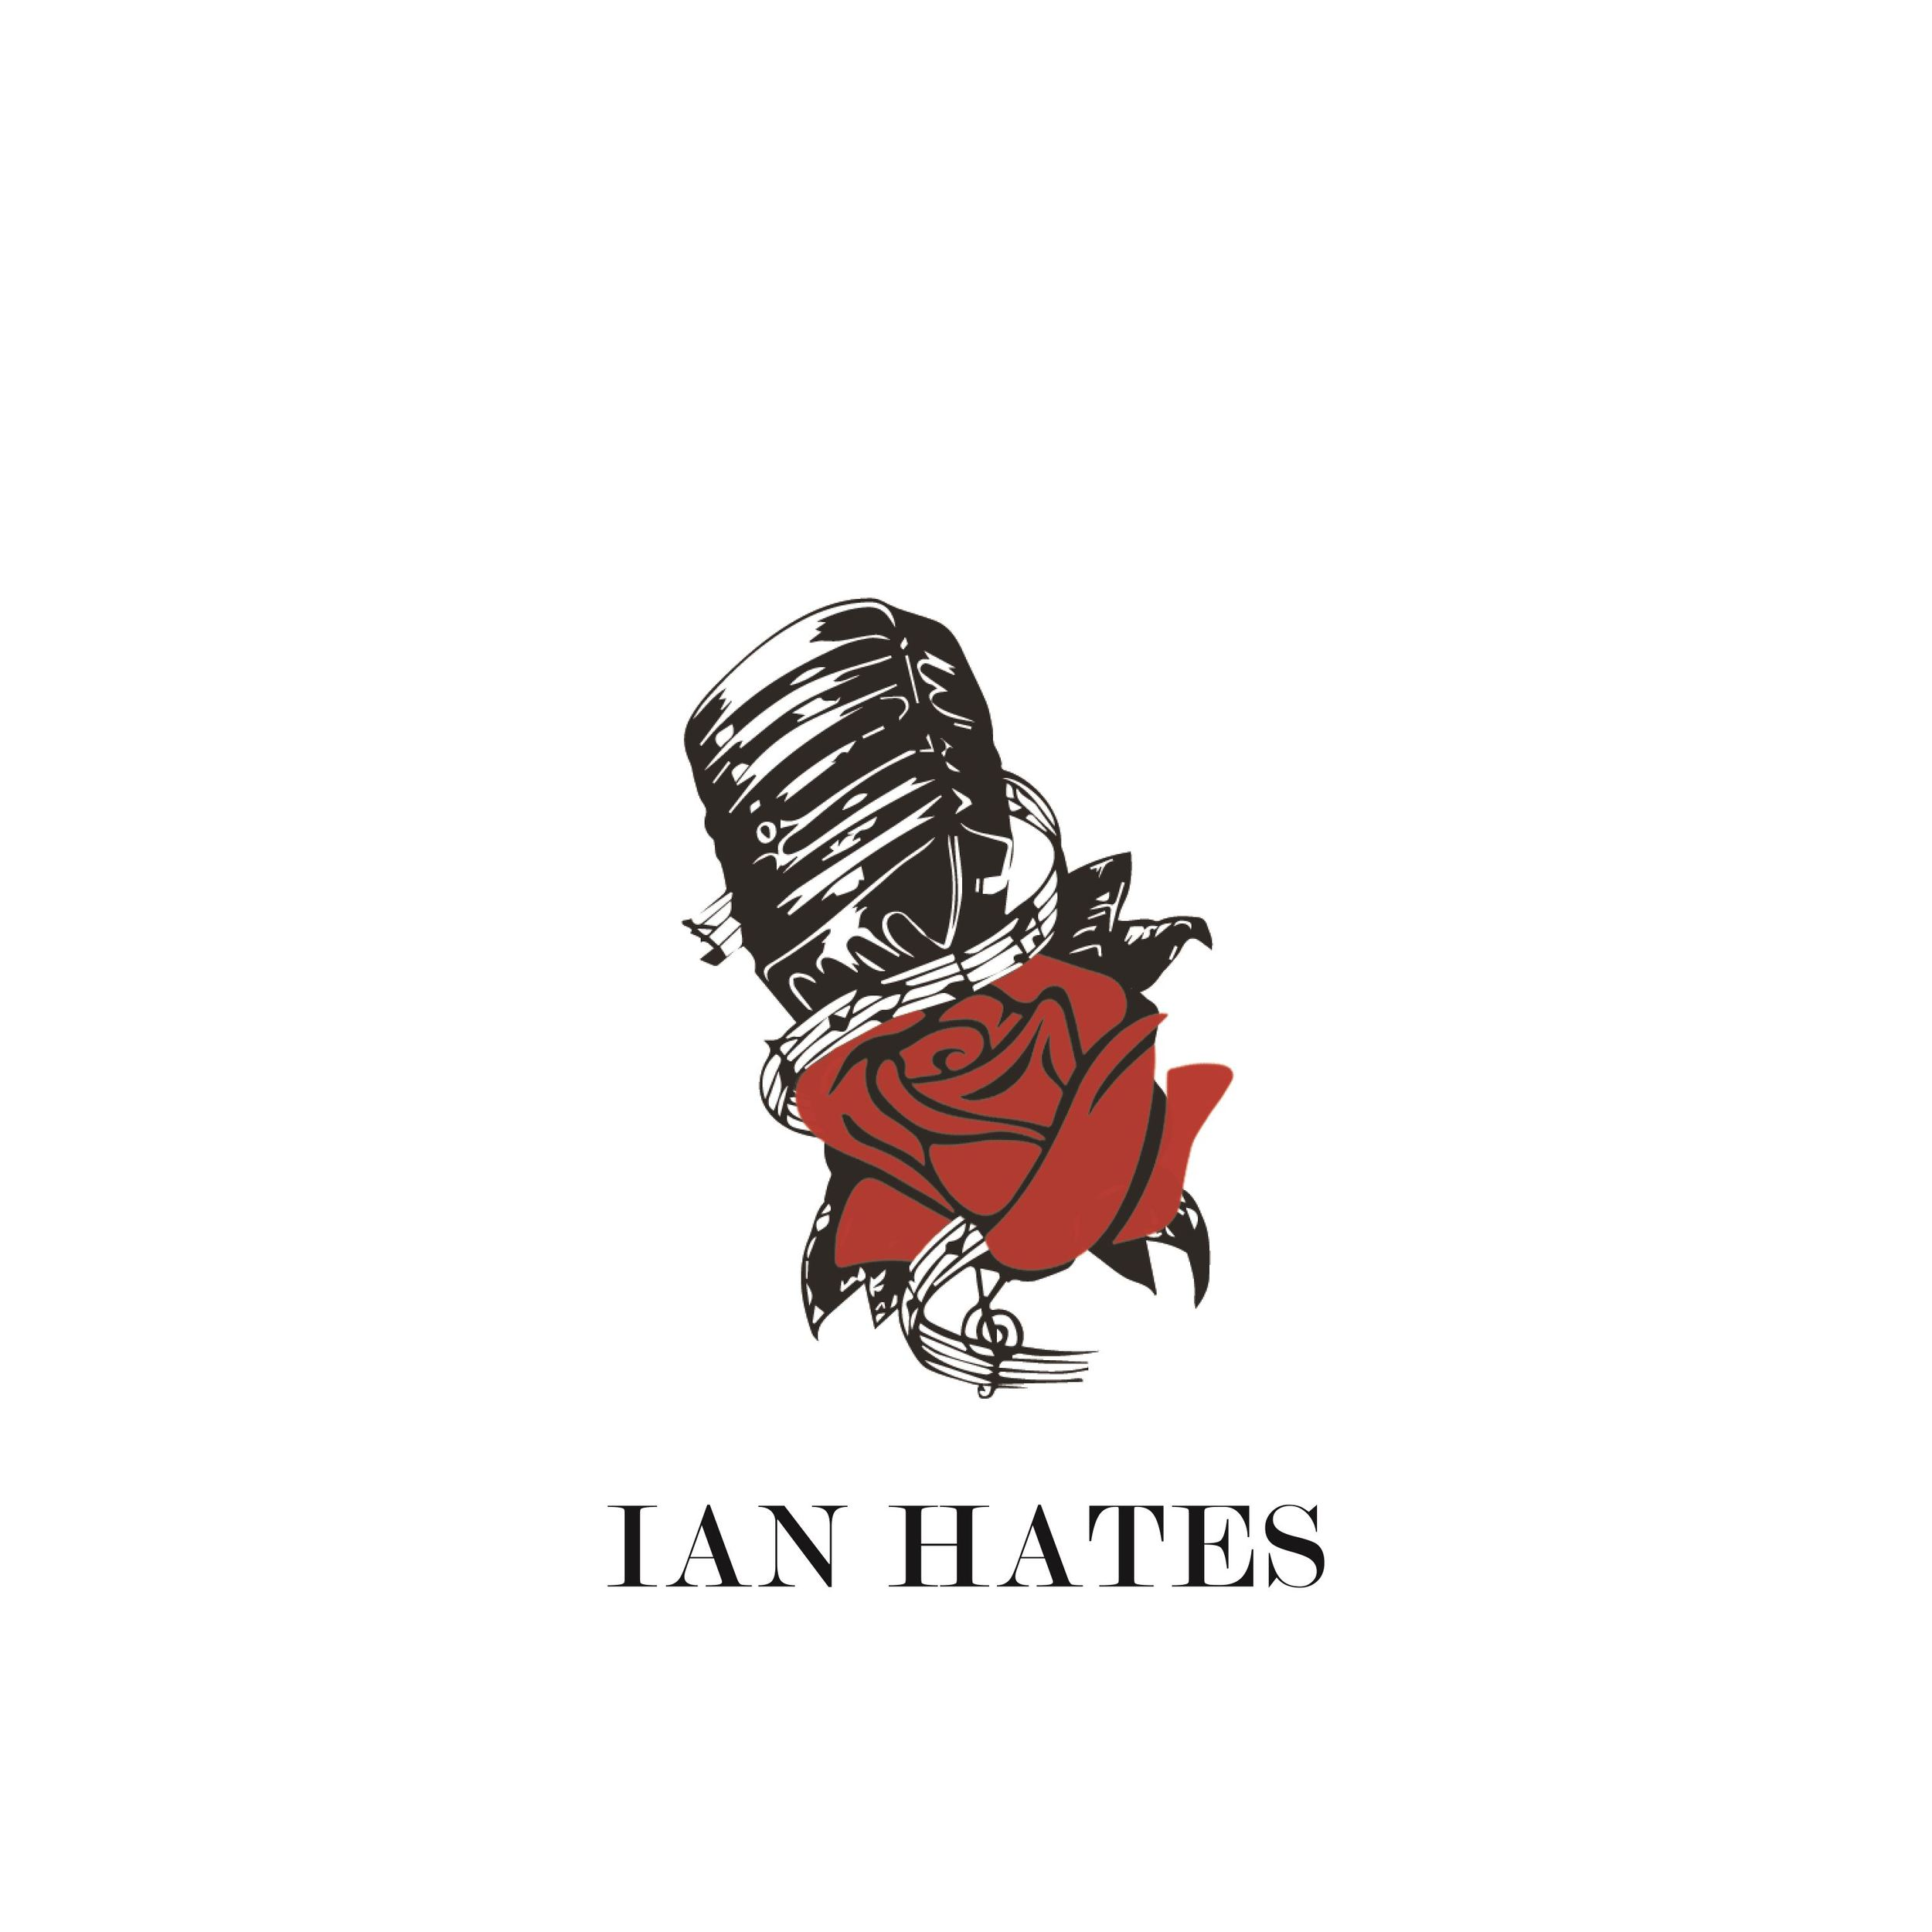 Ian Hates Resized.jpg